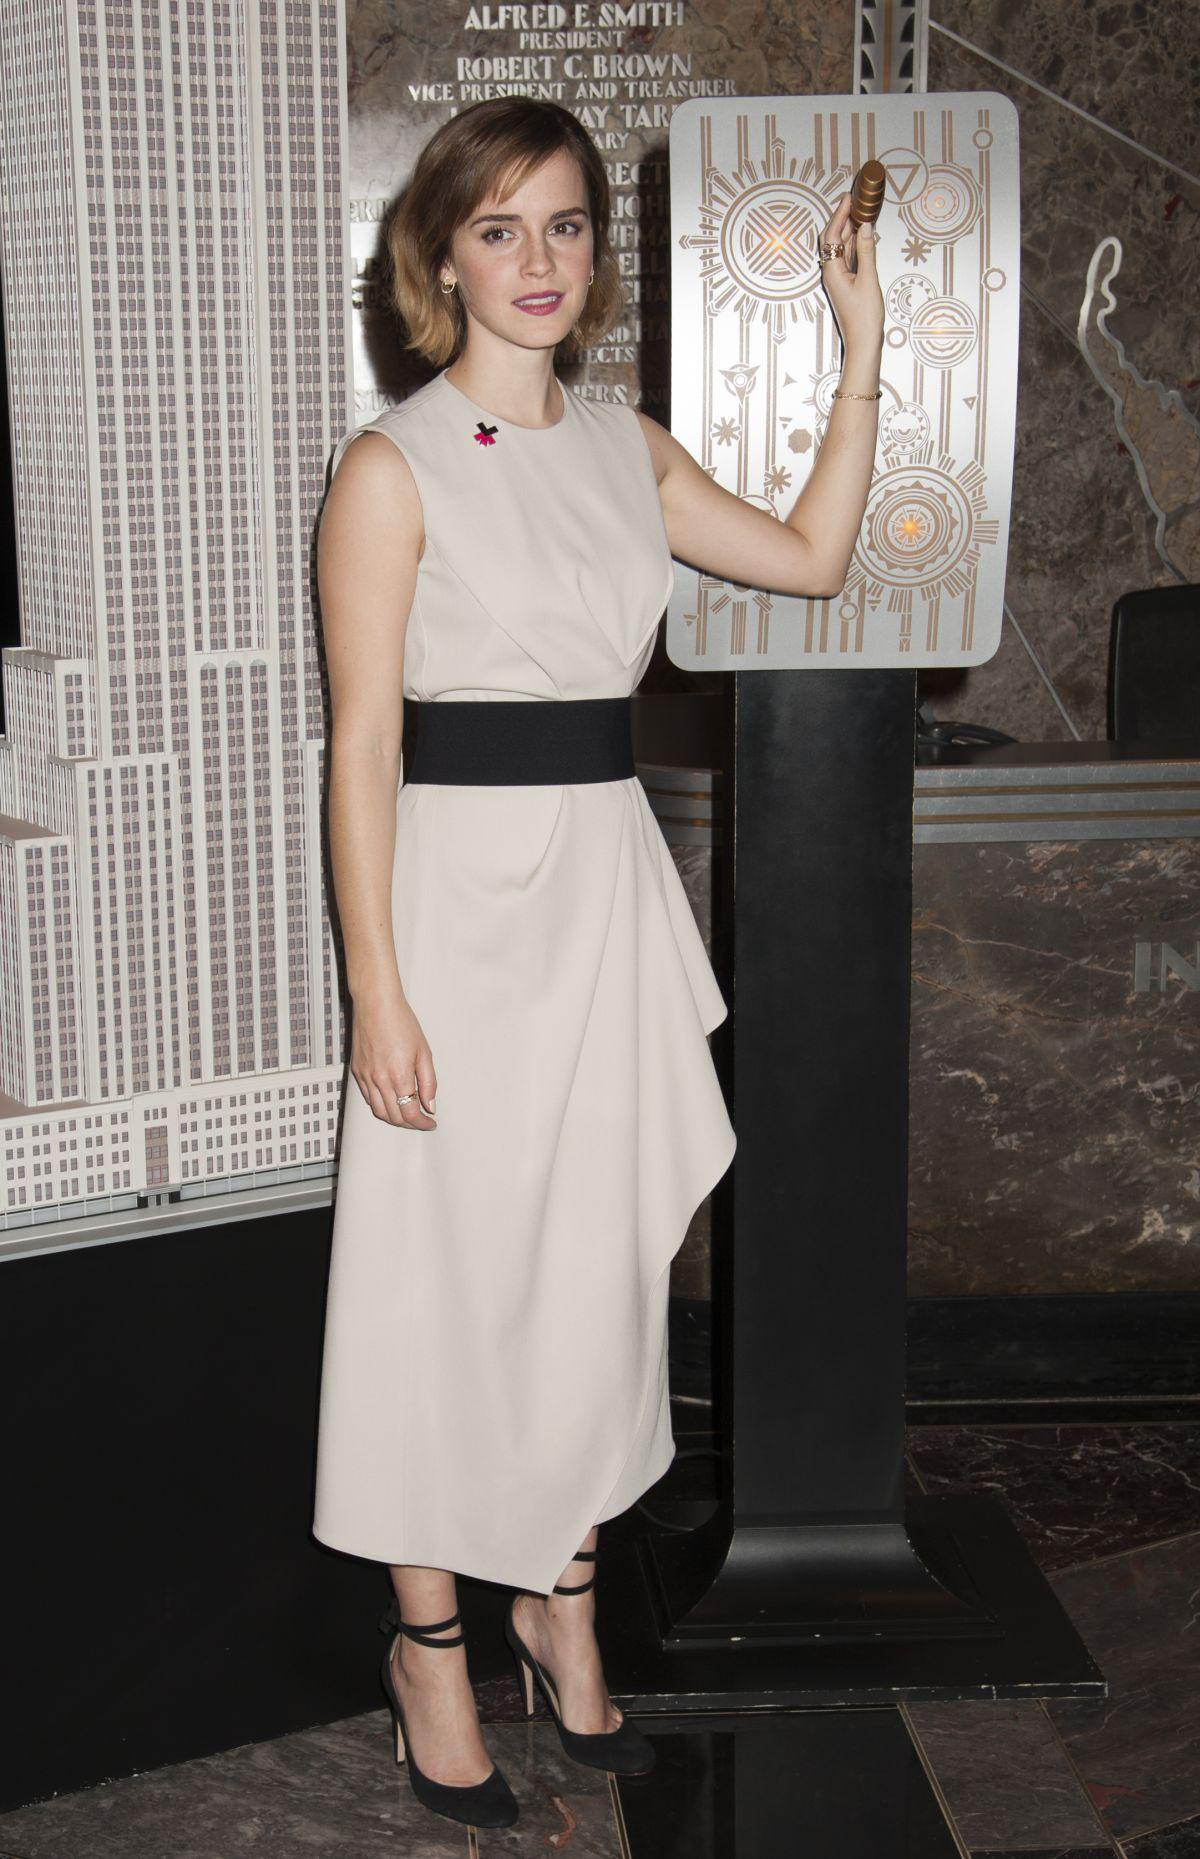 EMMA WATSON Lights Empire State Building for International Women